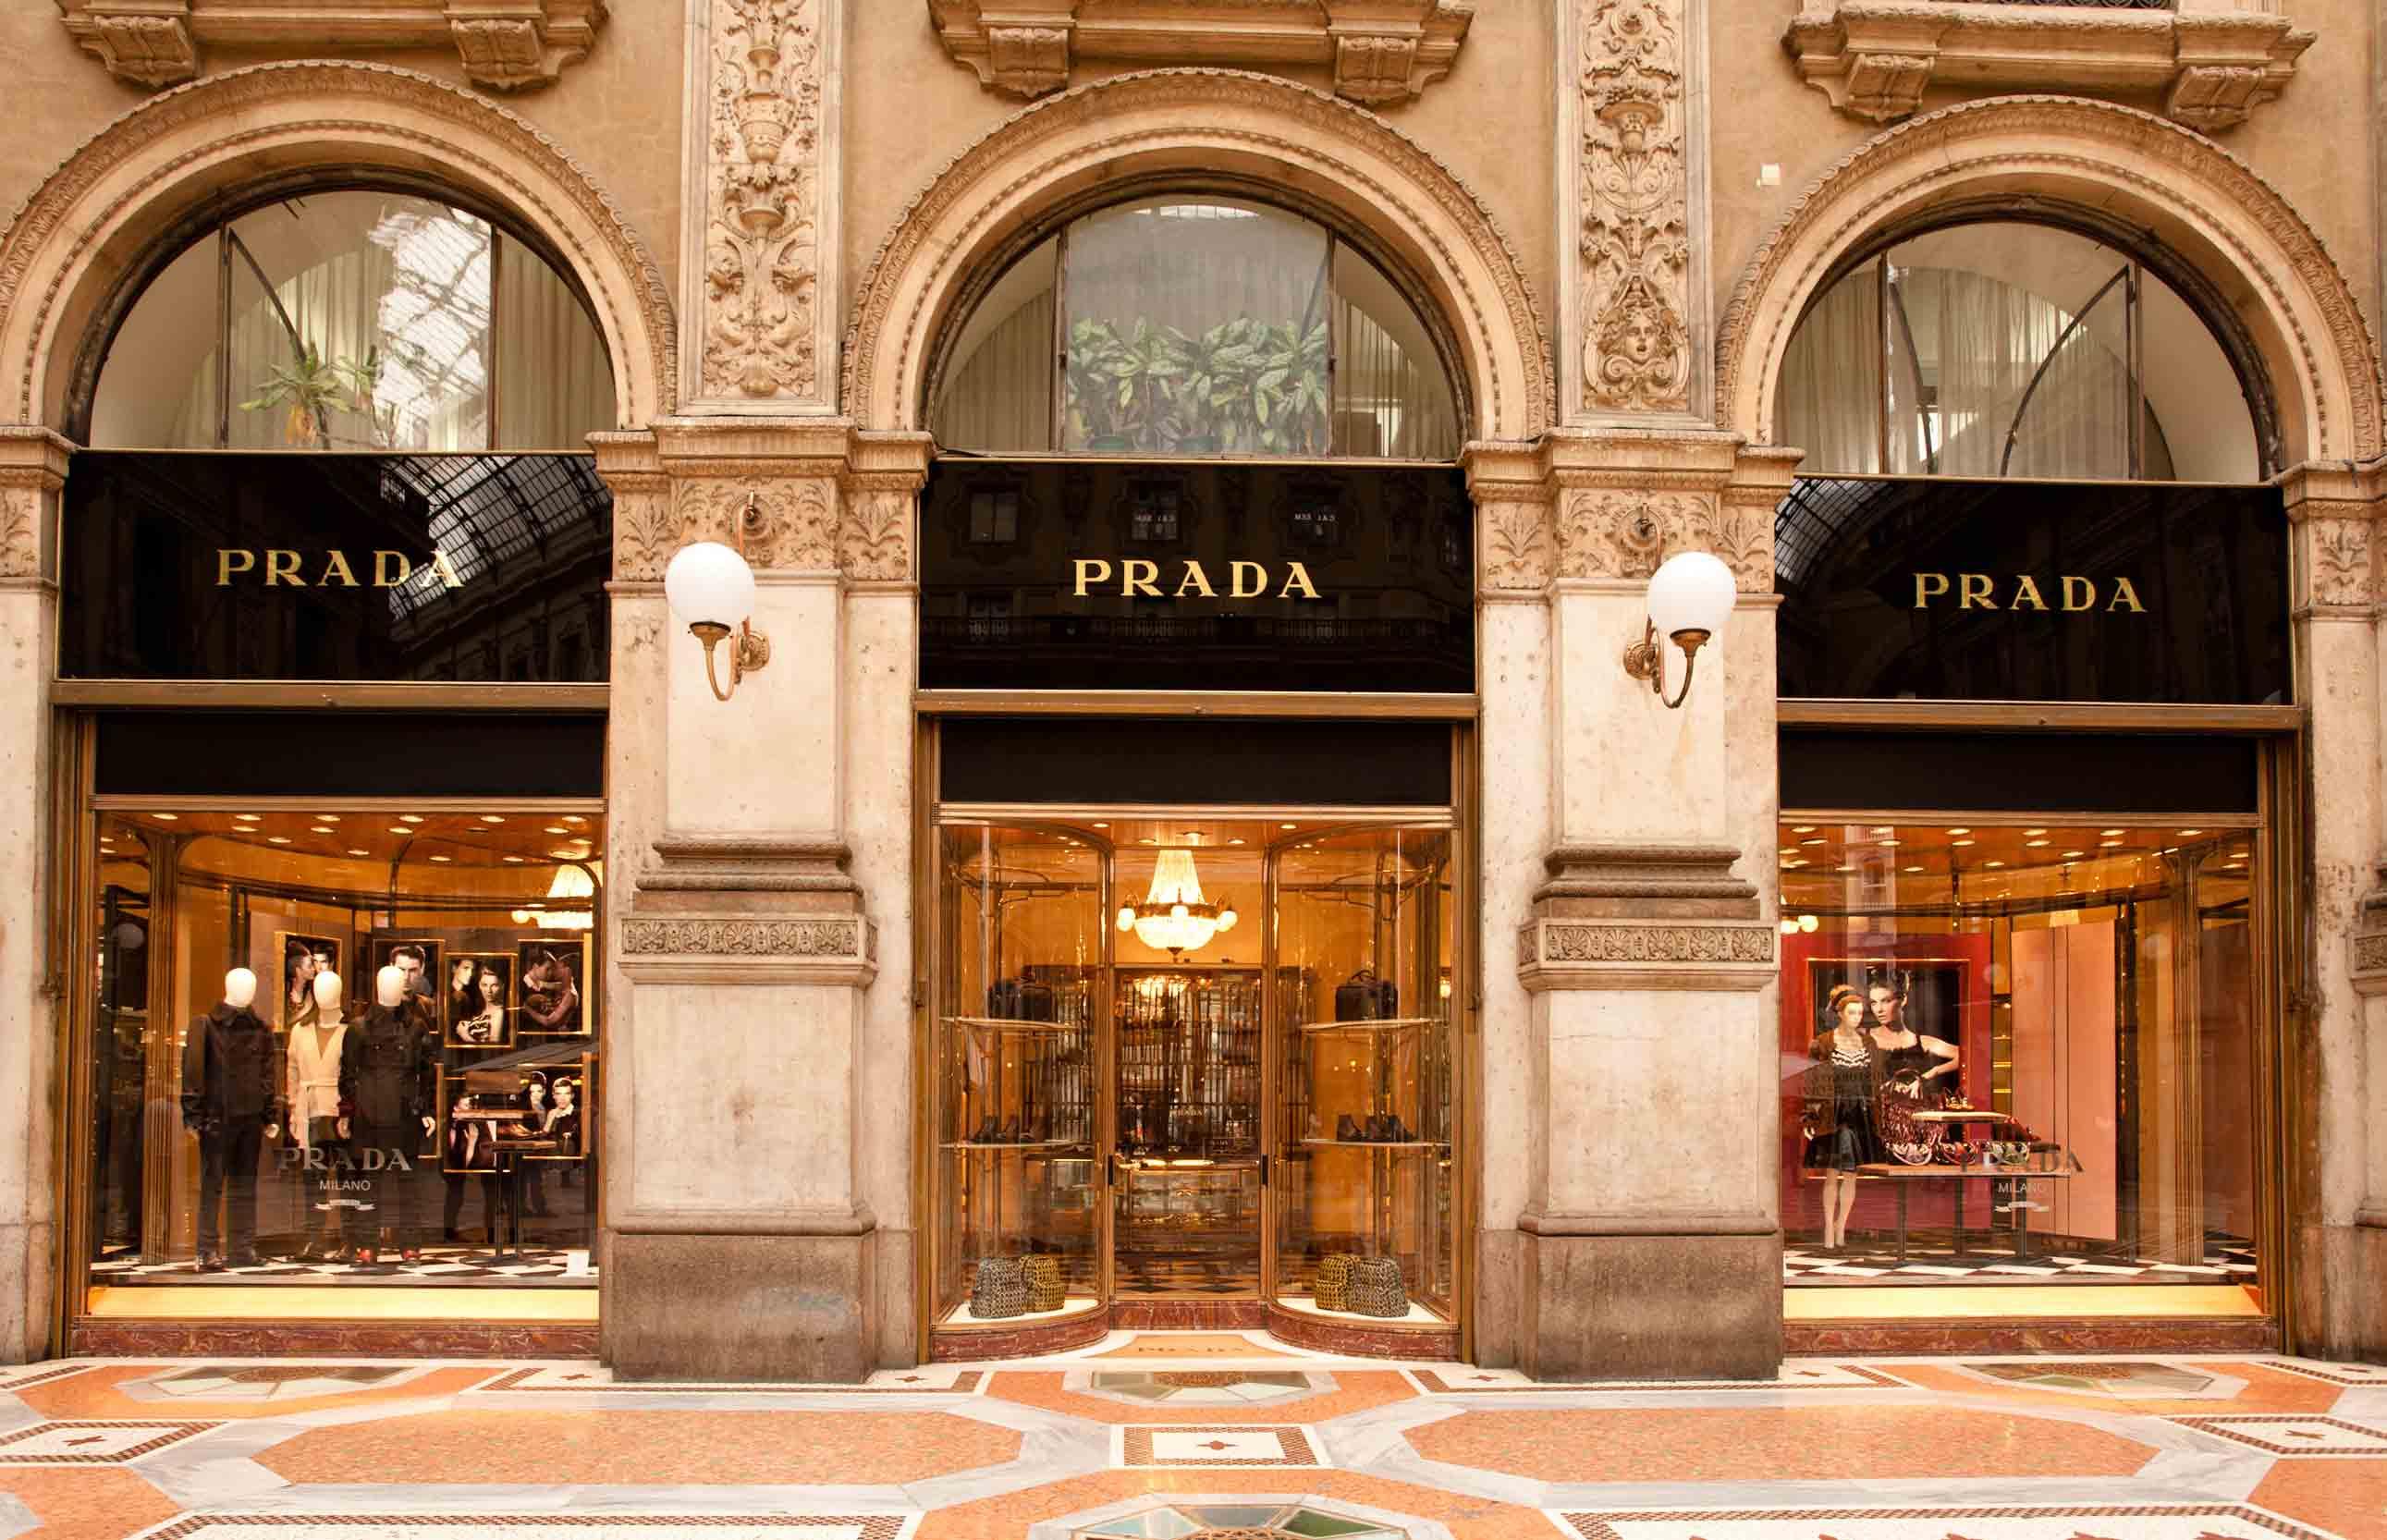 12 ways to save on prada - Home prada design ...